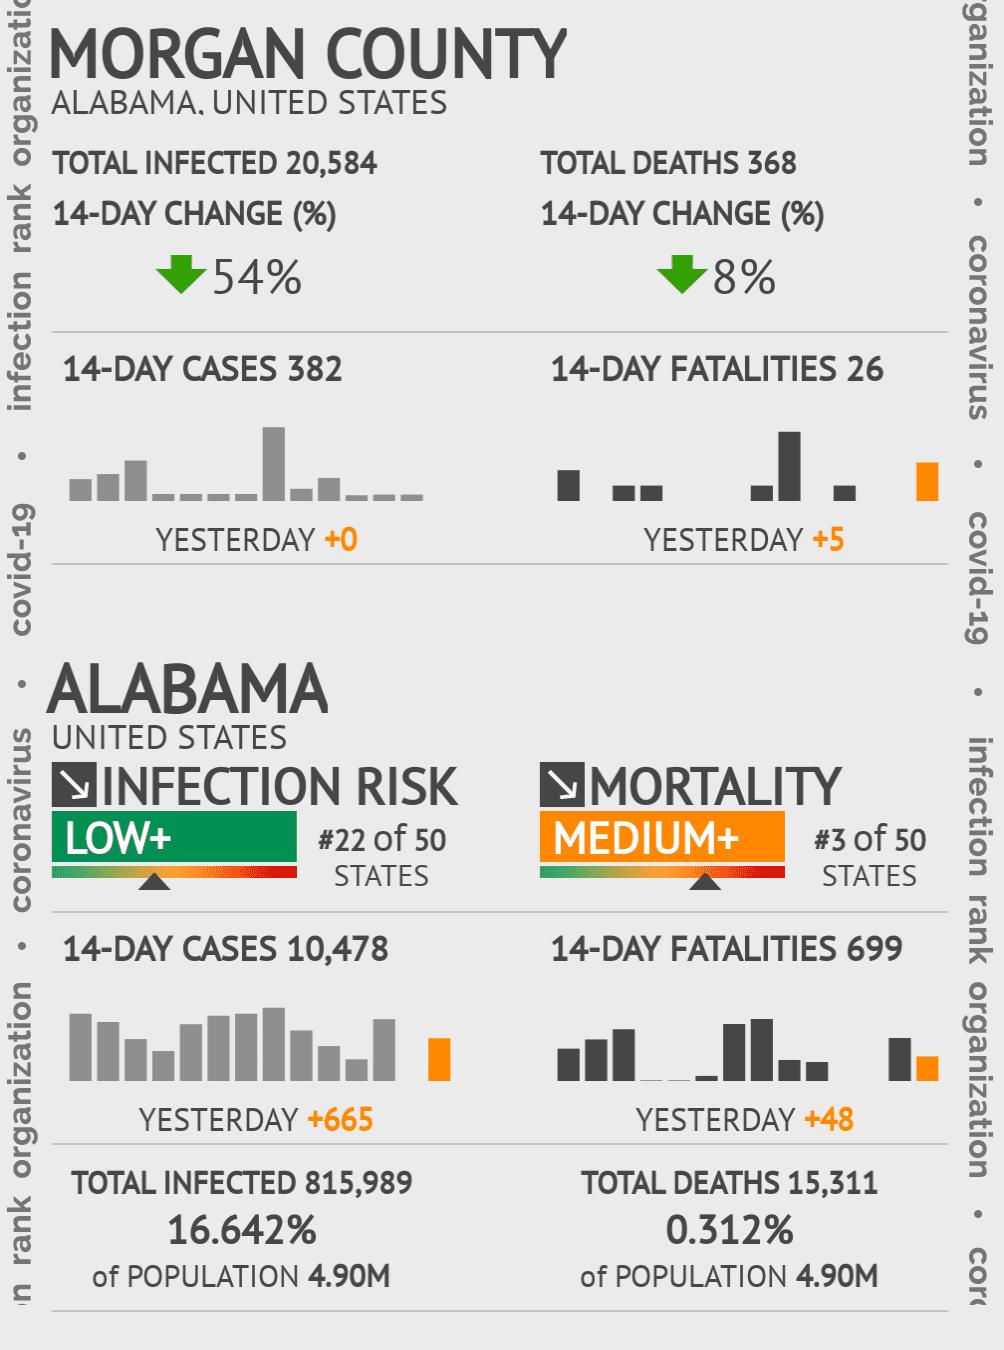 Morgan County Coronavirus Covid-19 Risk of Infection on February 28, 2021